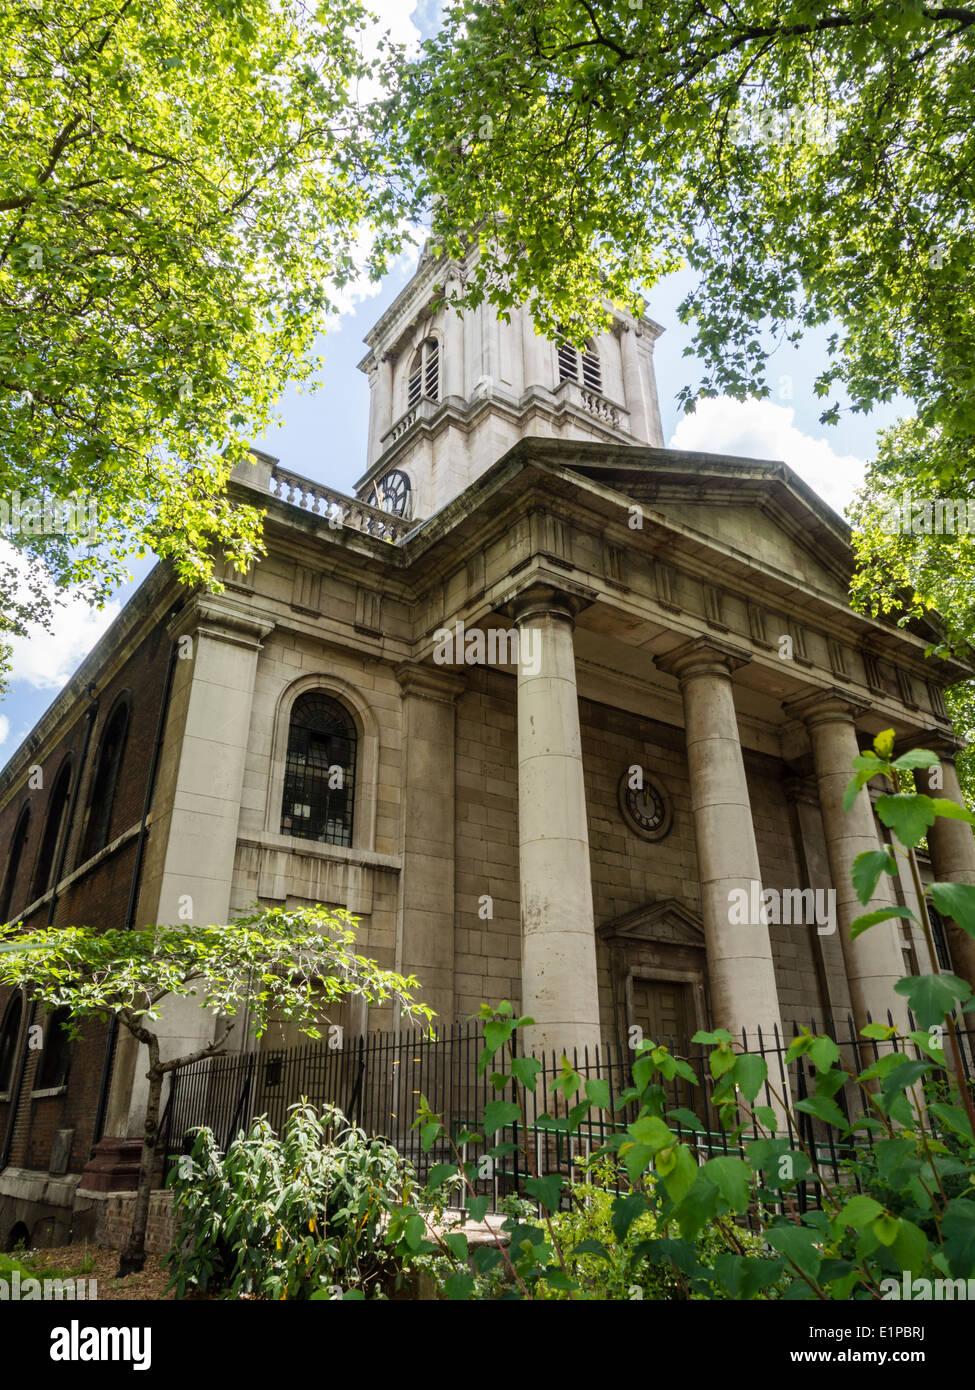 Shoreditch Church: St Leonards Shoreditch Stock Photos & St Leonards